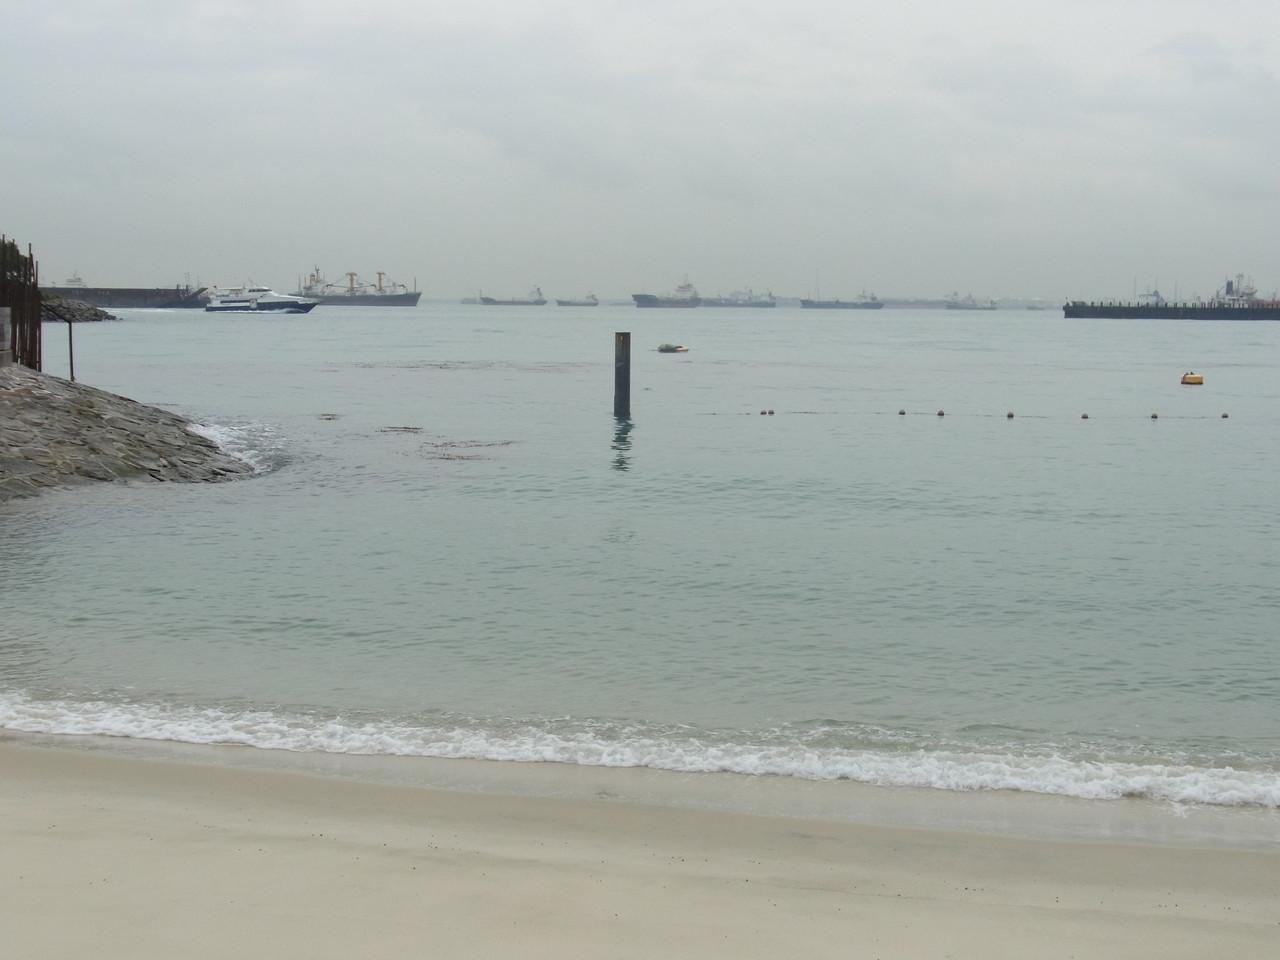 Around Malacca Strait